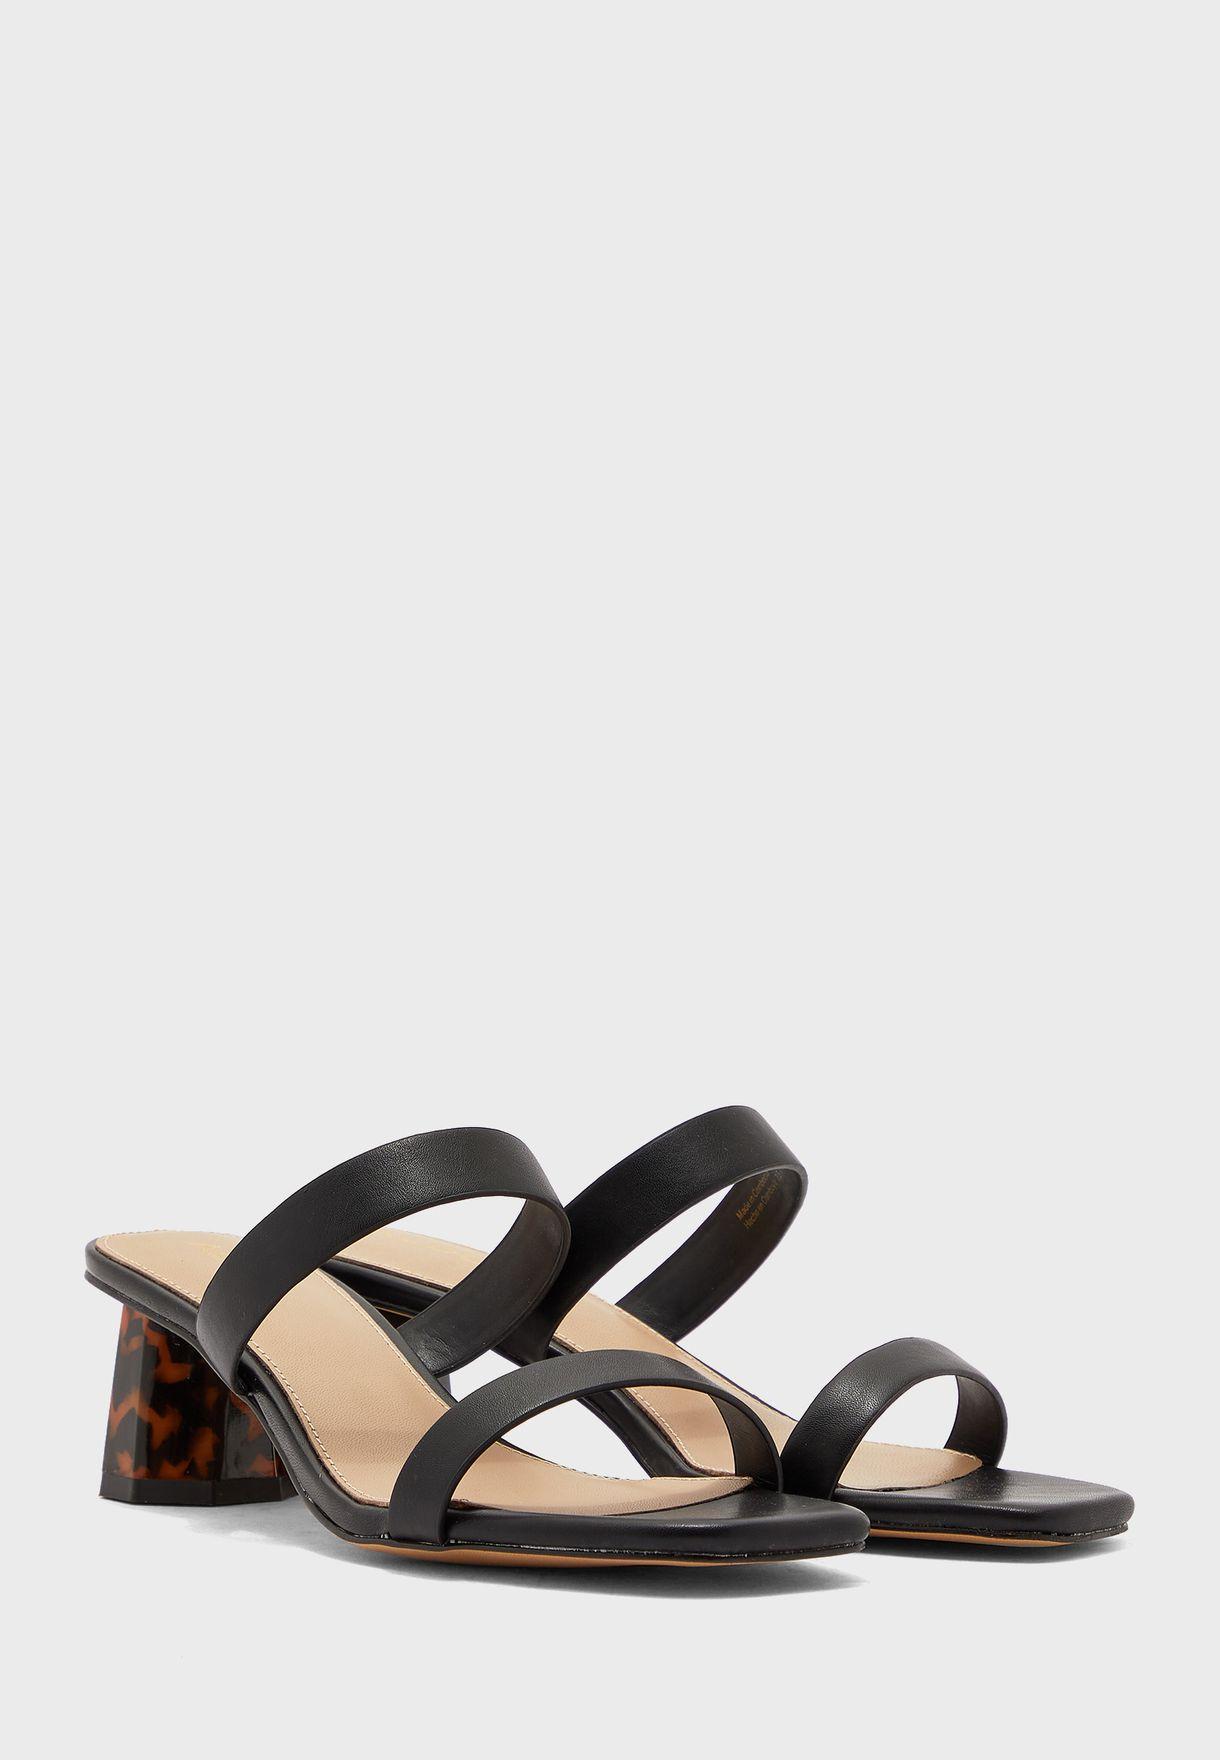 Etealia Low Heel Sandal